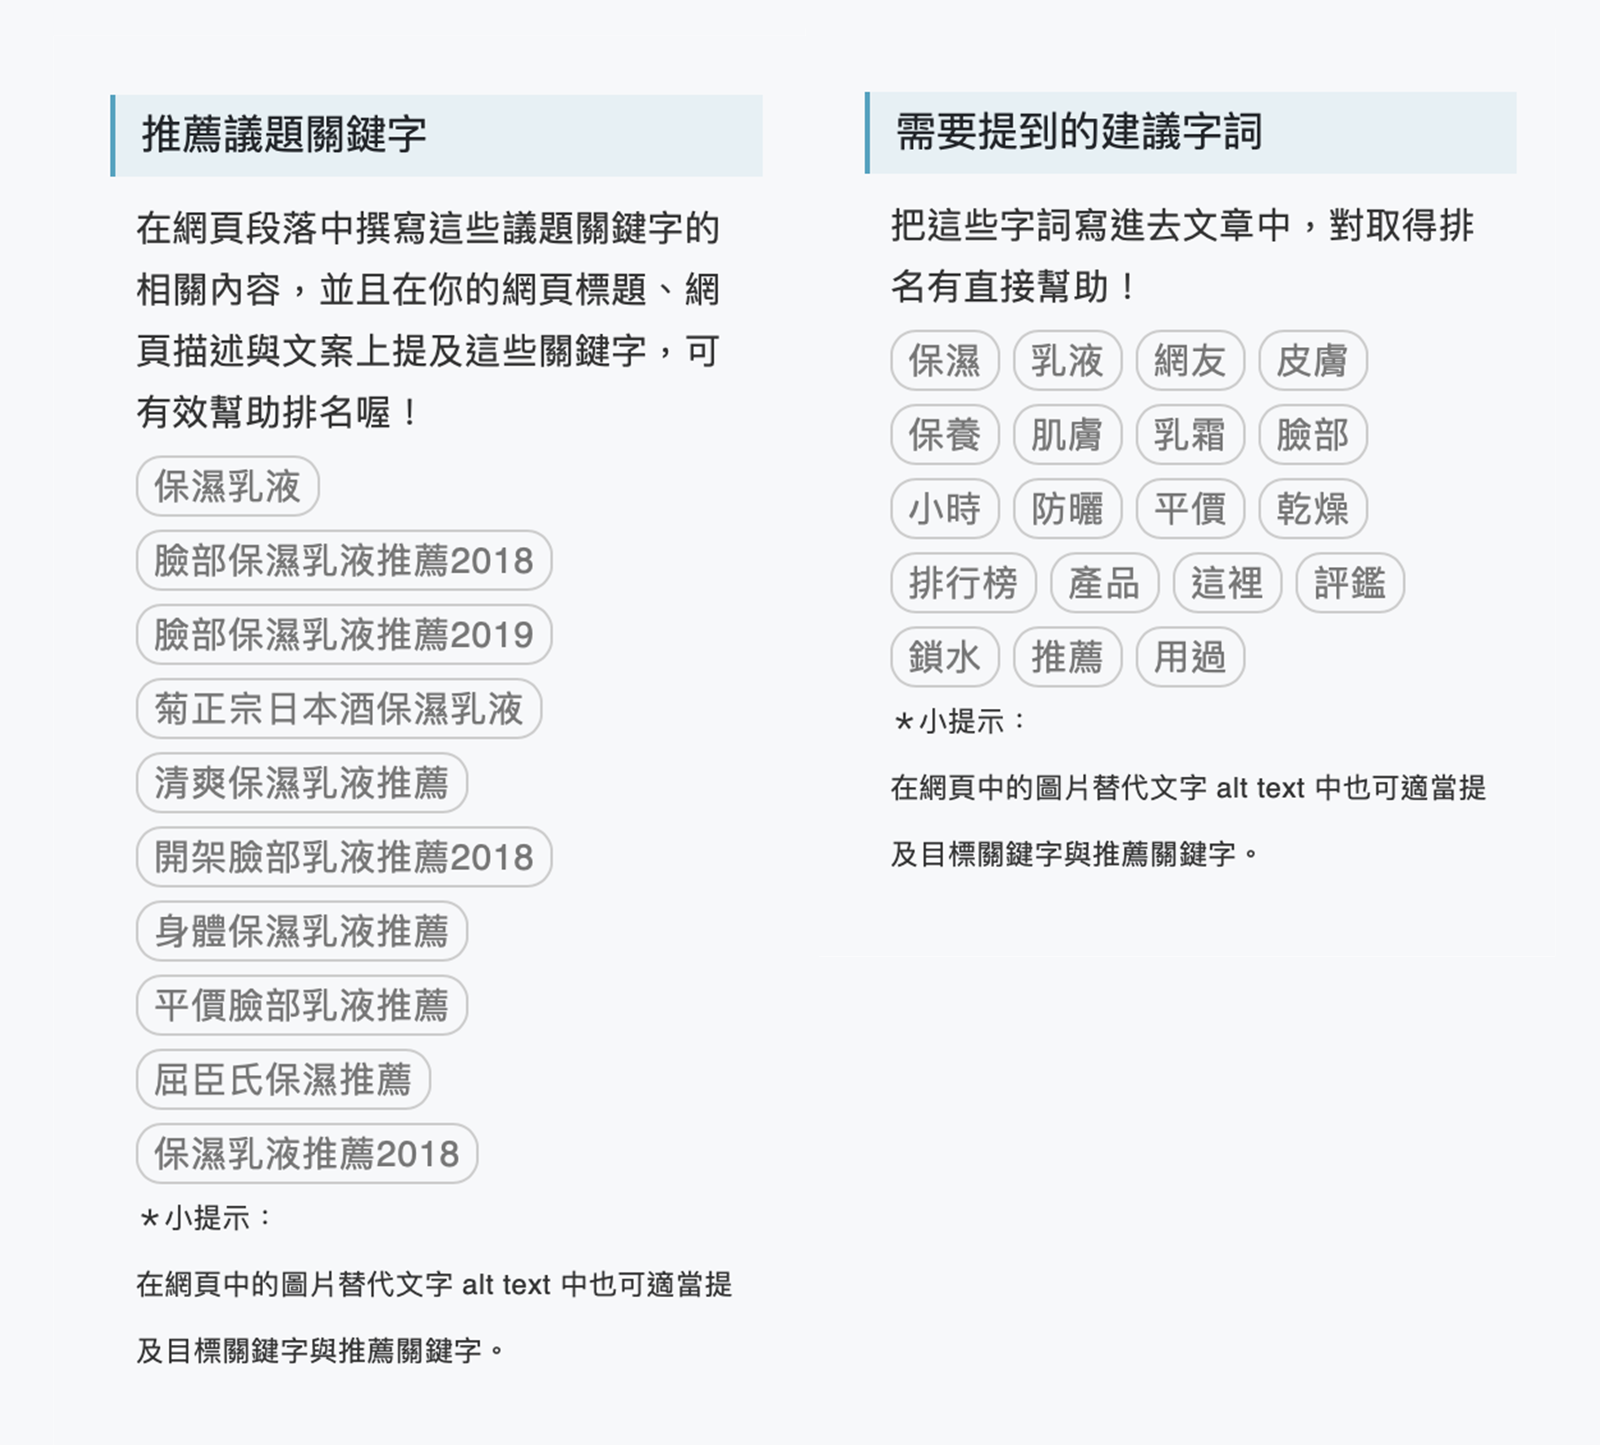 Ranking 文案規劃工具